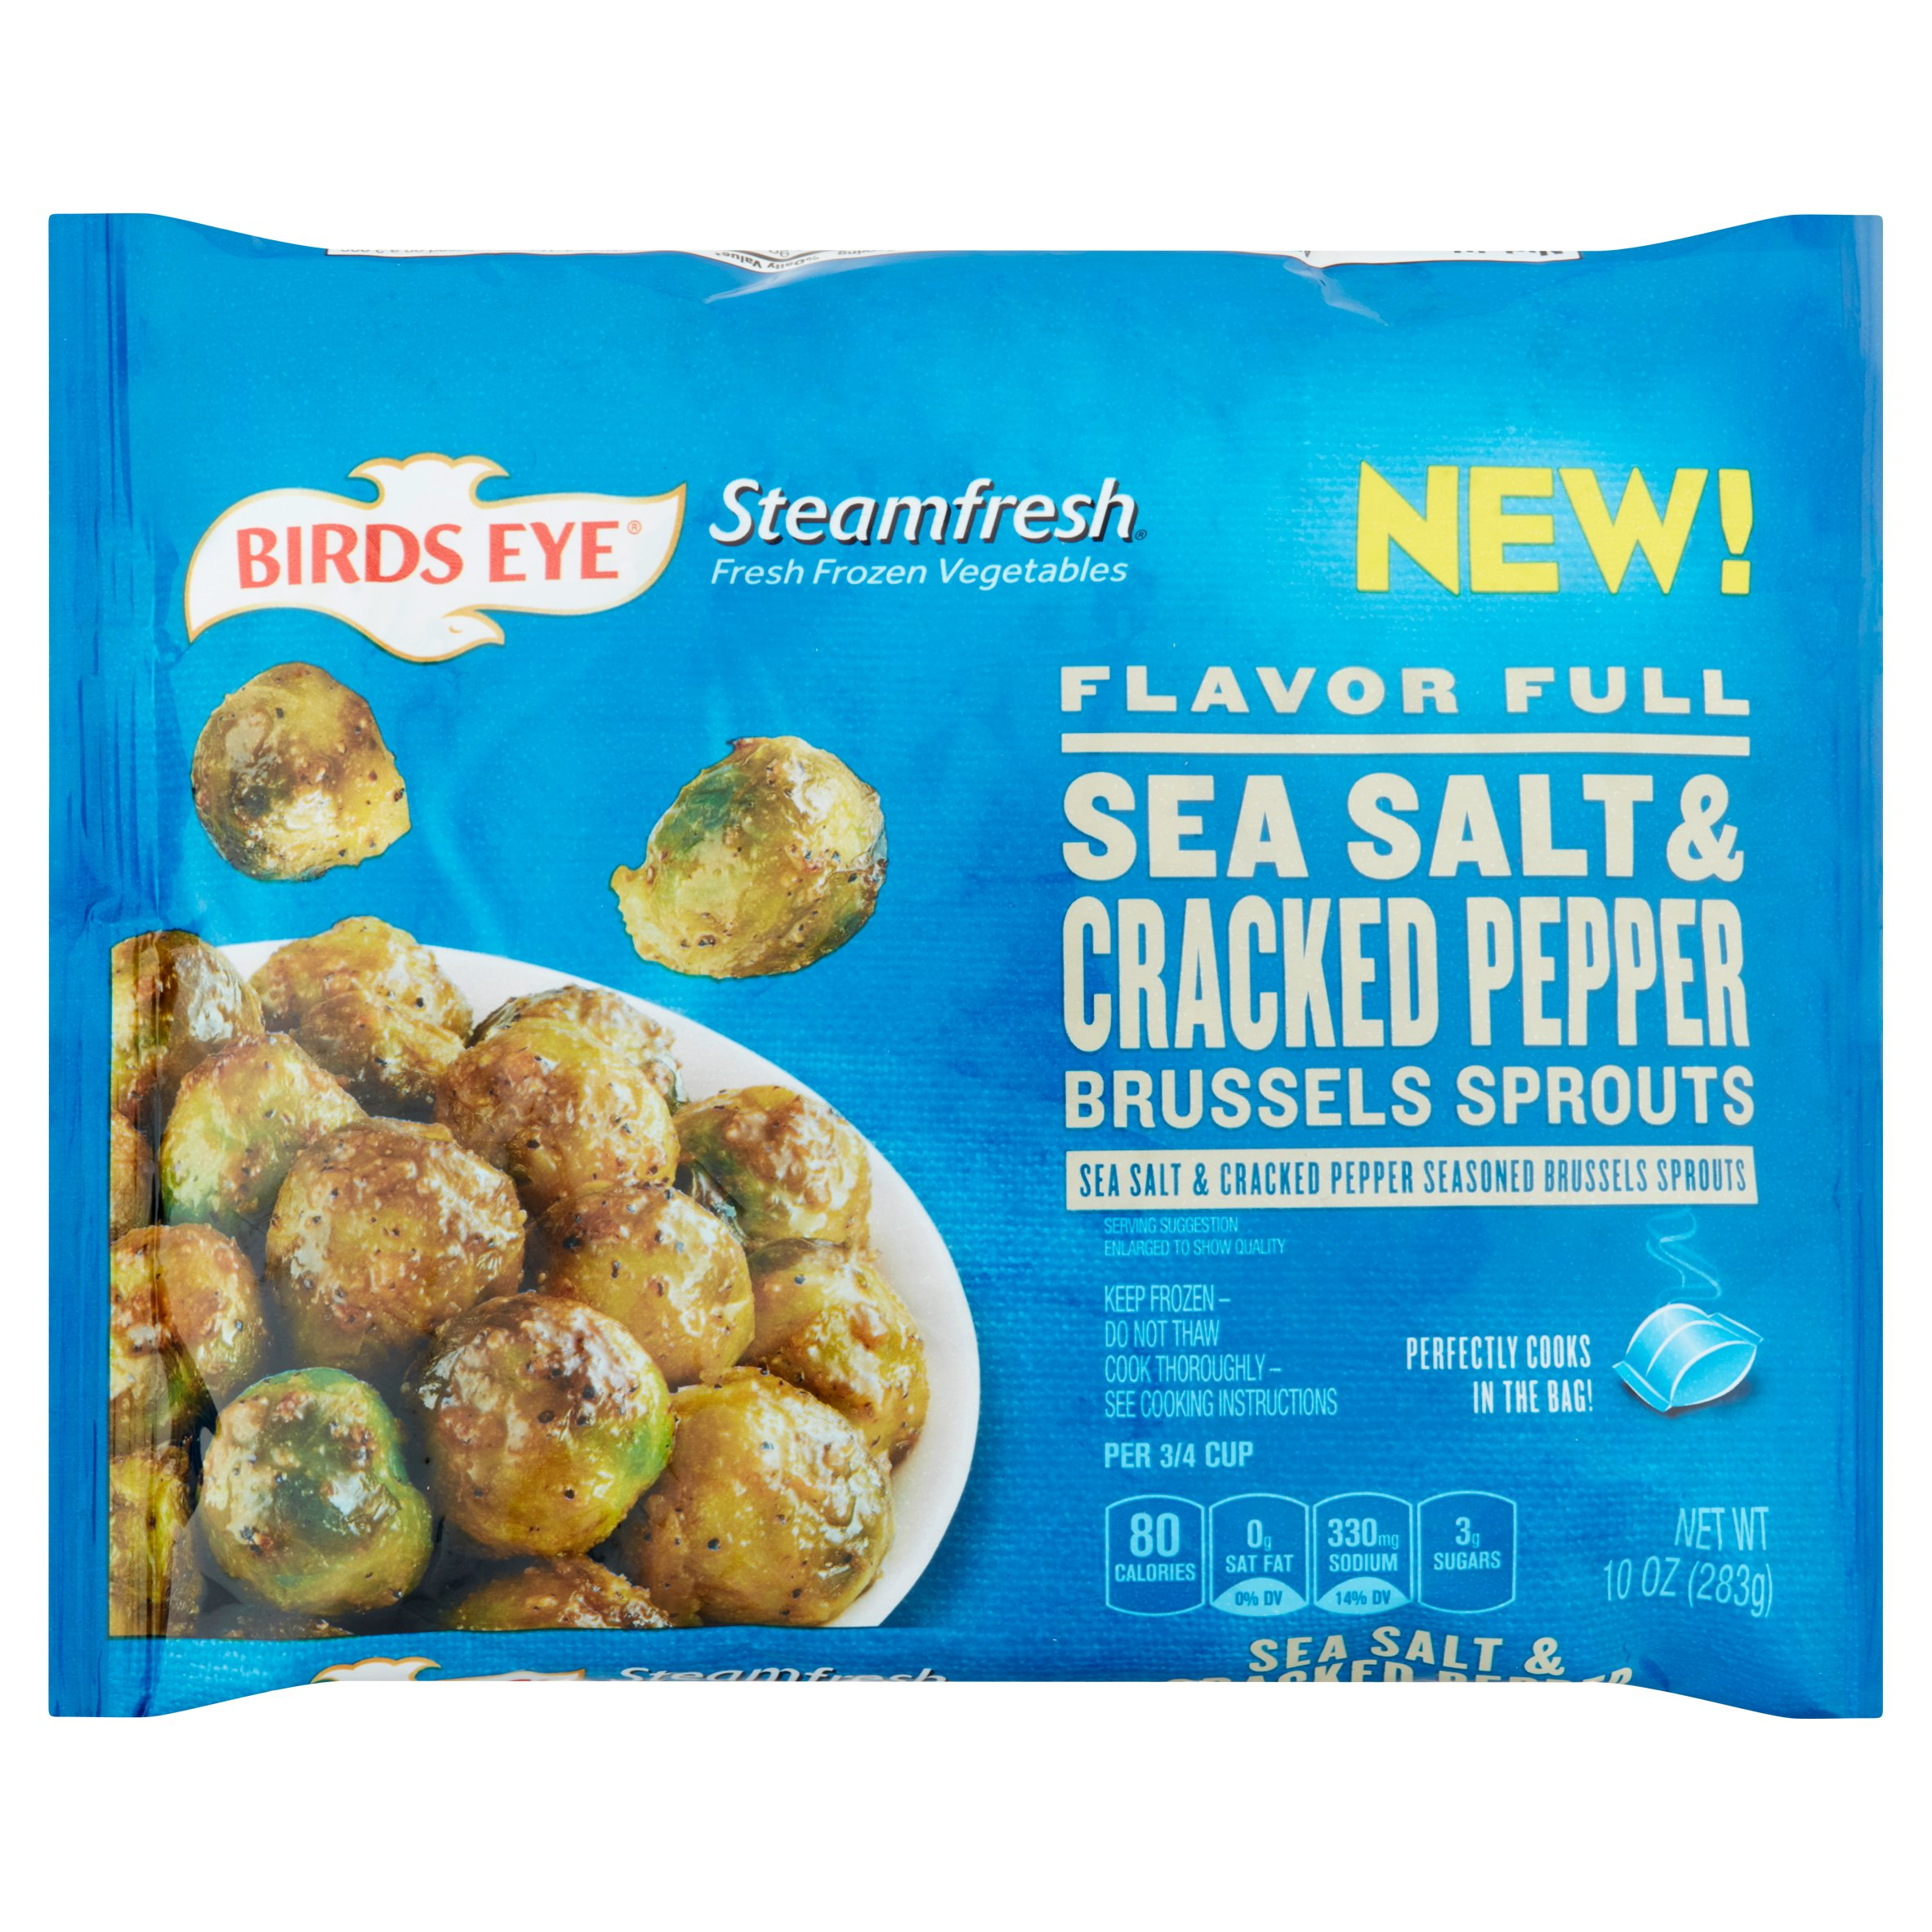 Birds Eye Steamfresh Flavor Full Sea Salt & Cracked Pepper Brussles Sprouts, 10 oz